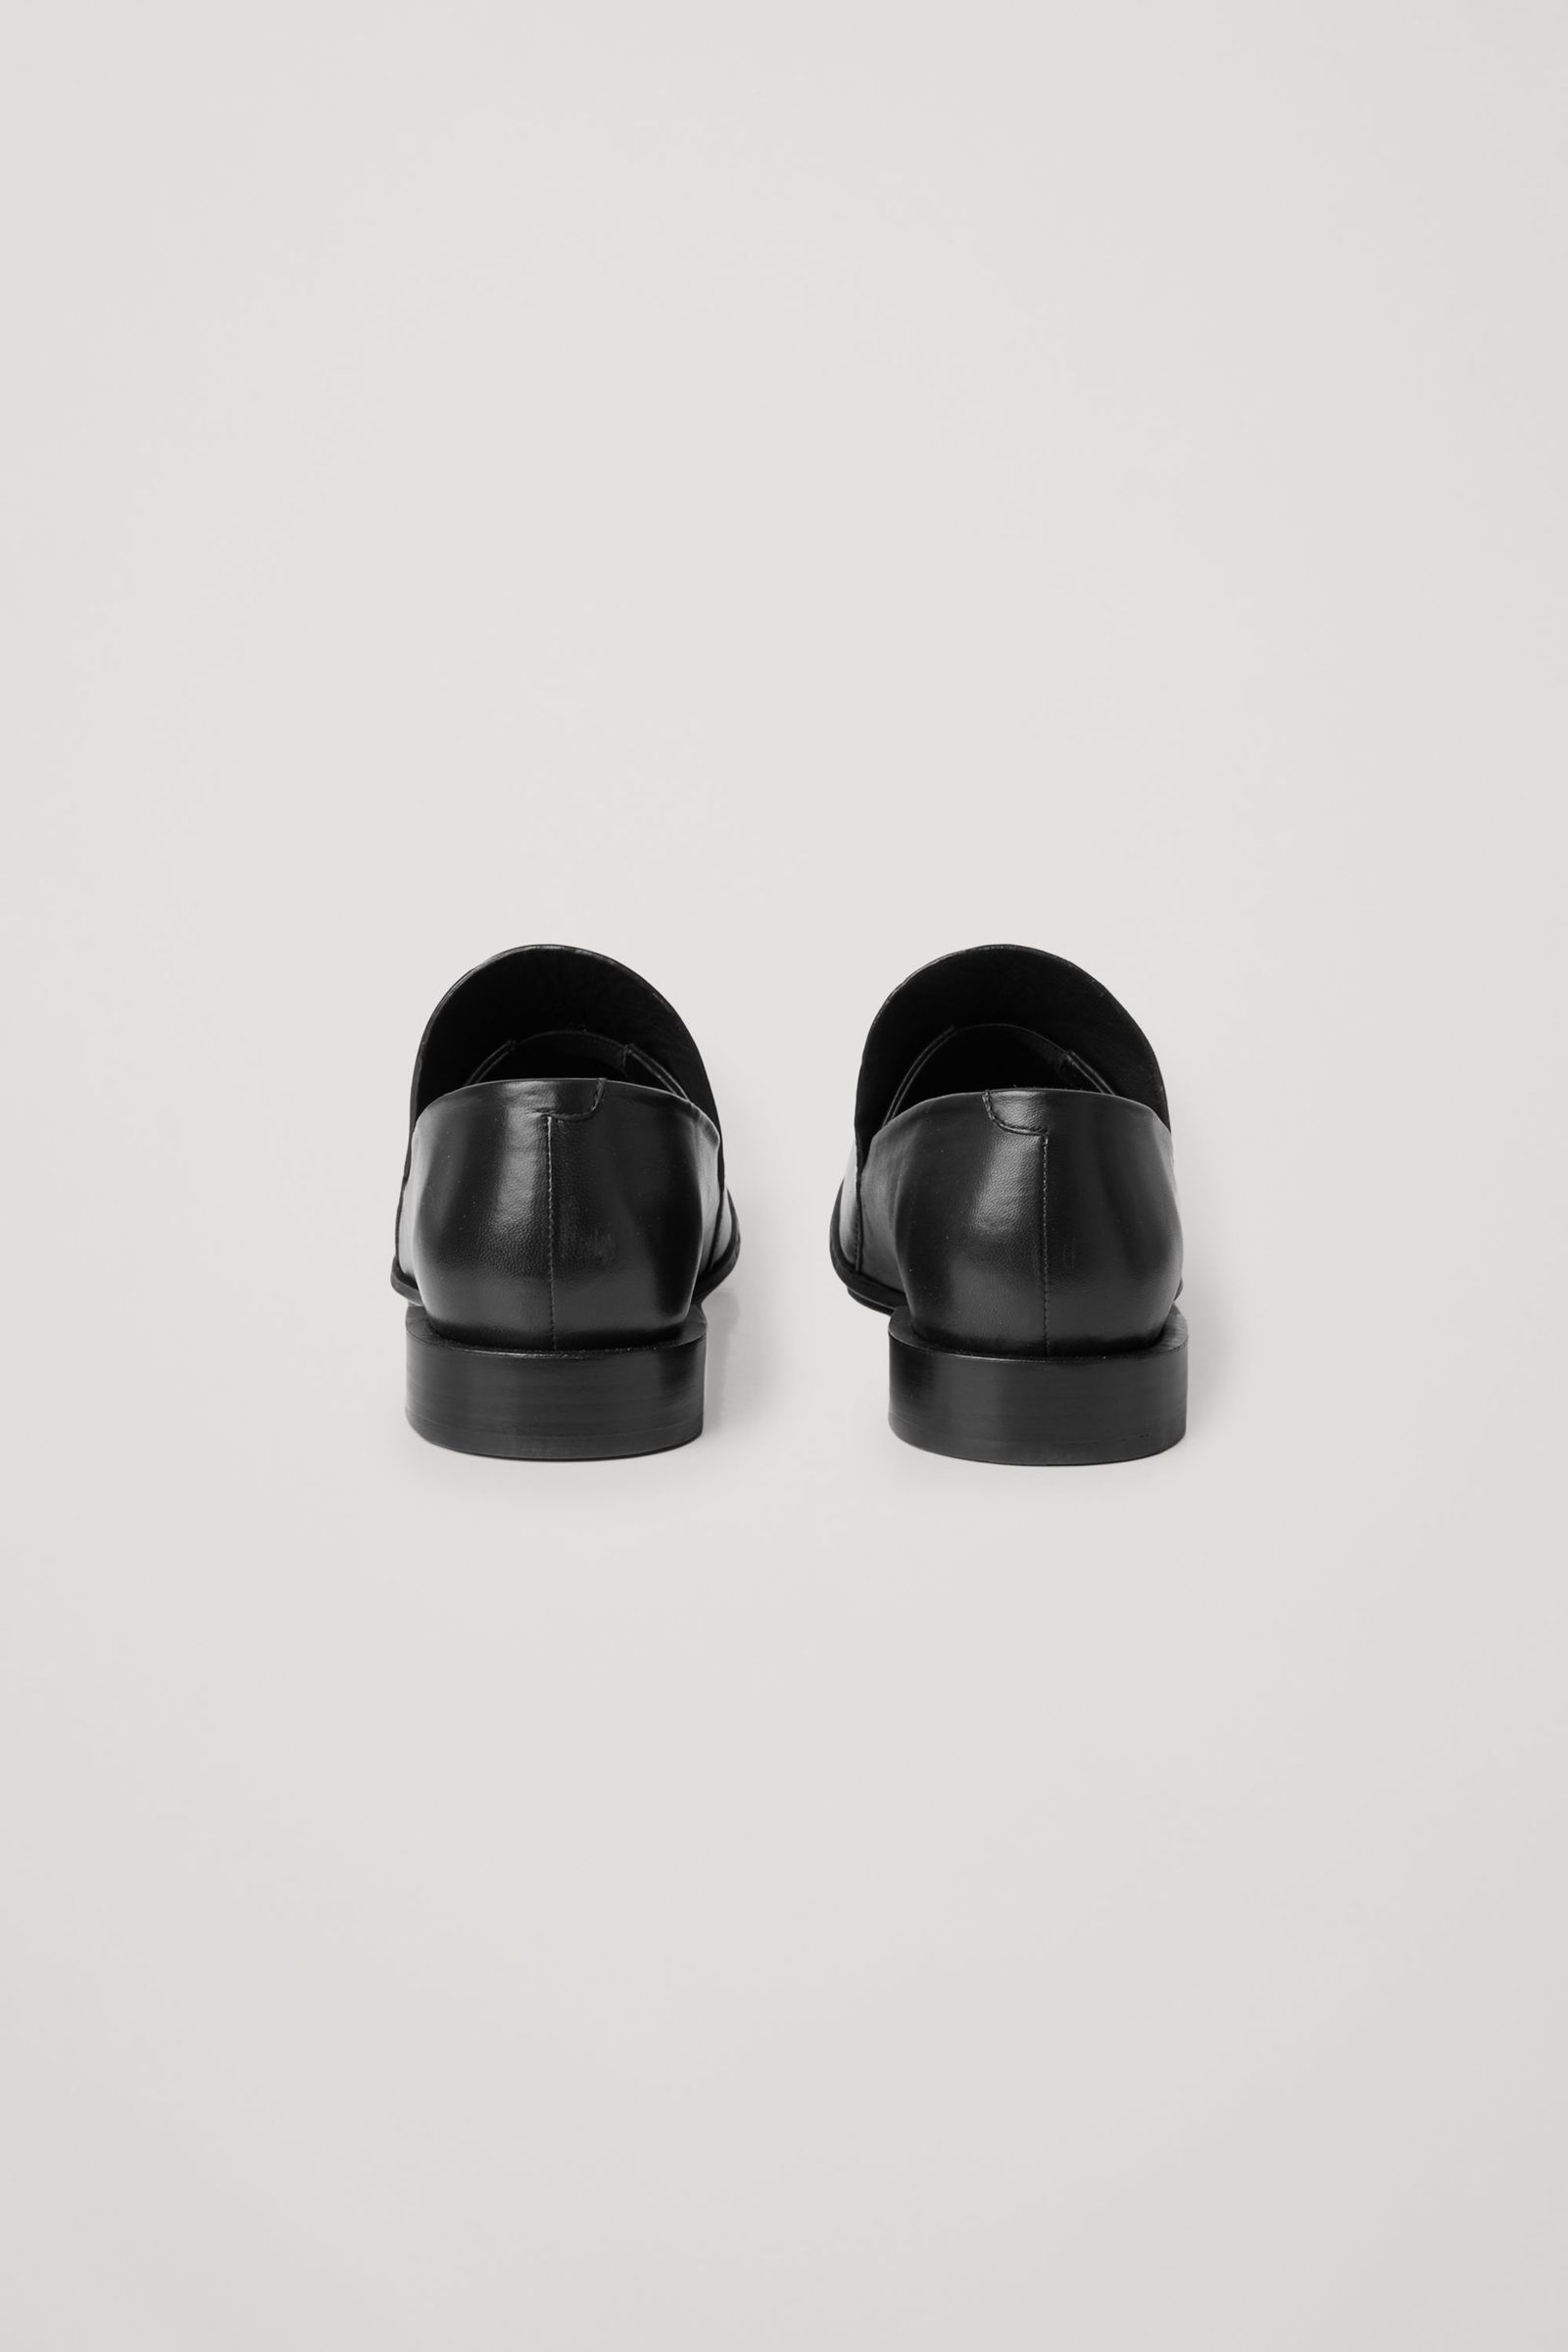 COS 지오메트릭 힐 레더 로퍼의 블랙컬러 Product입니다.